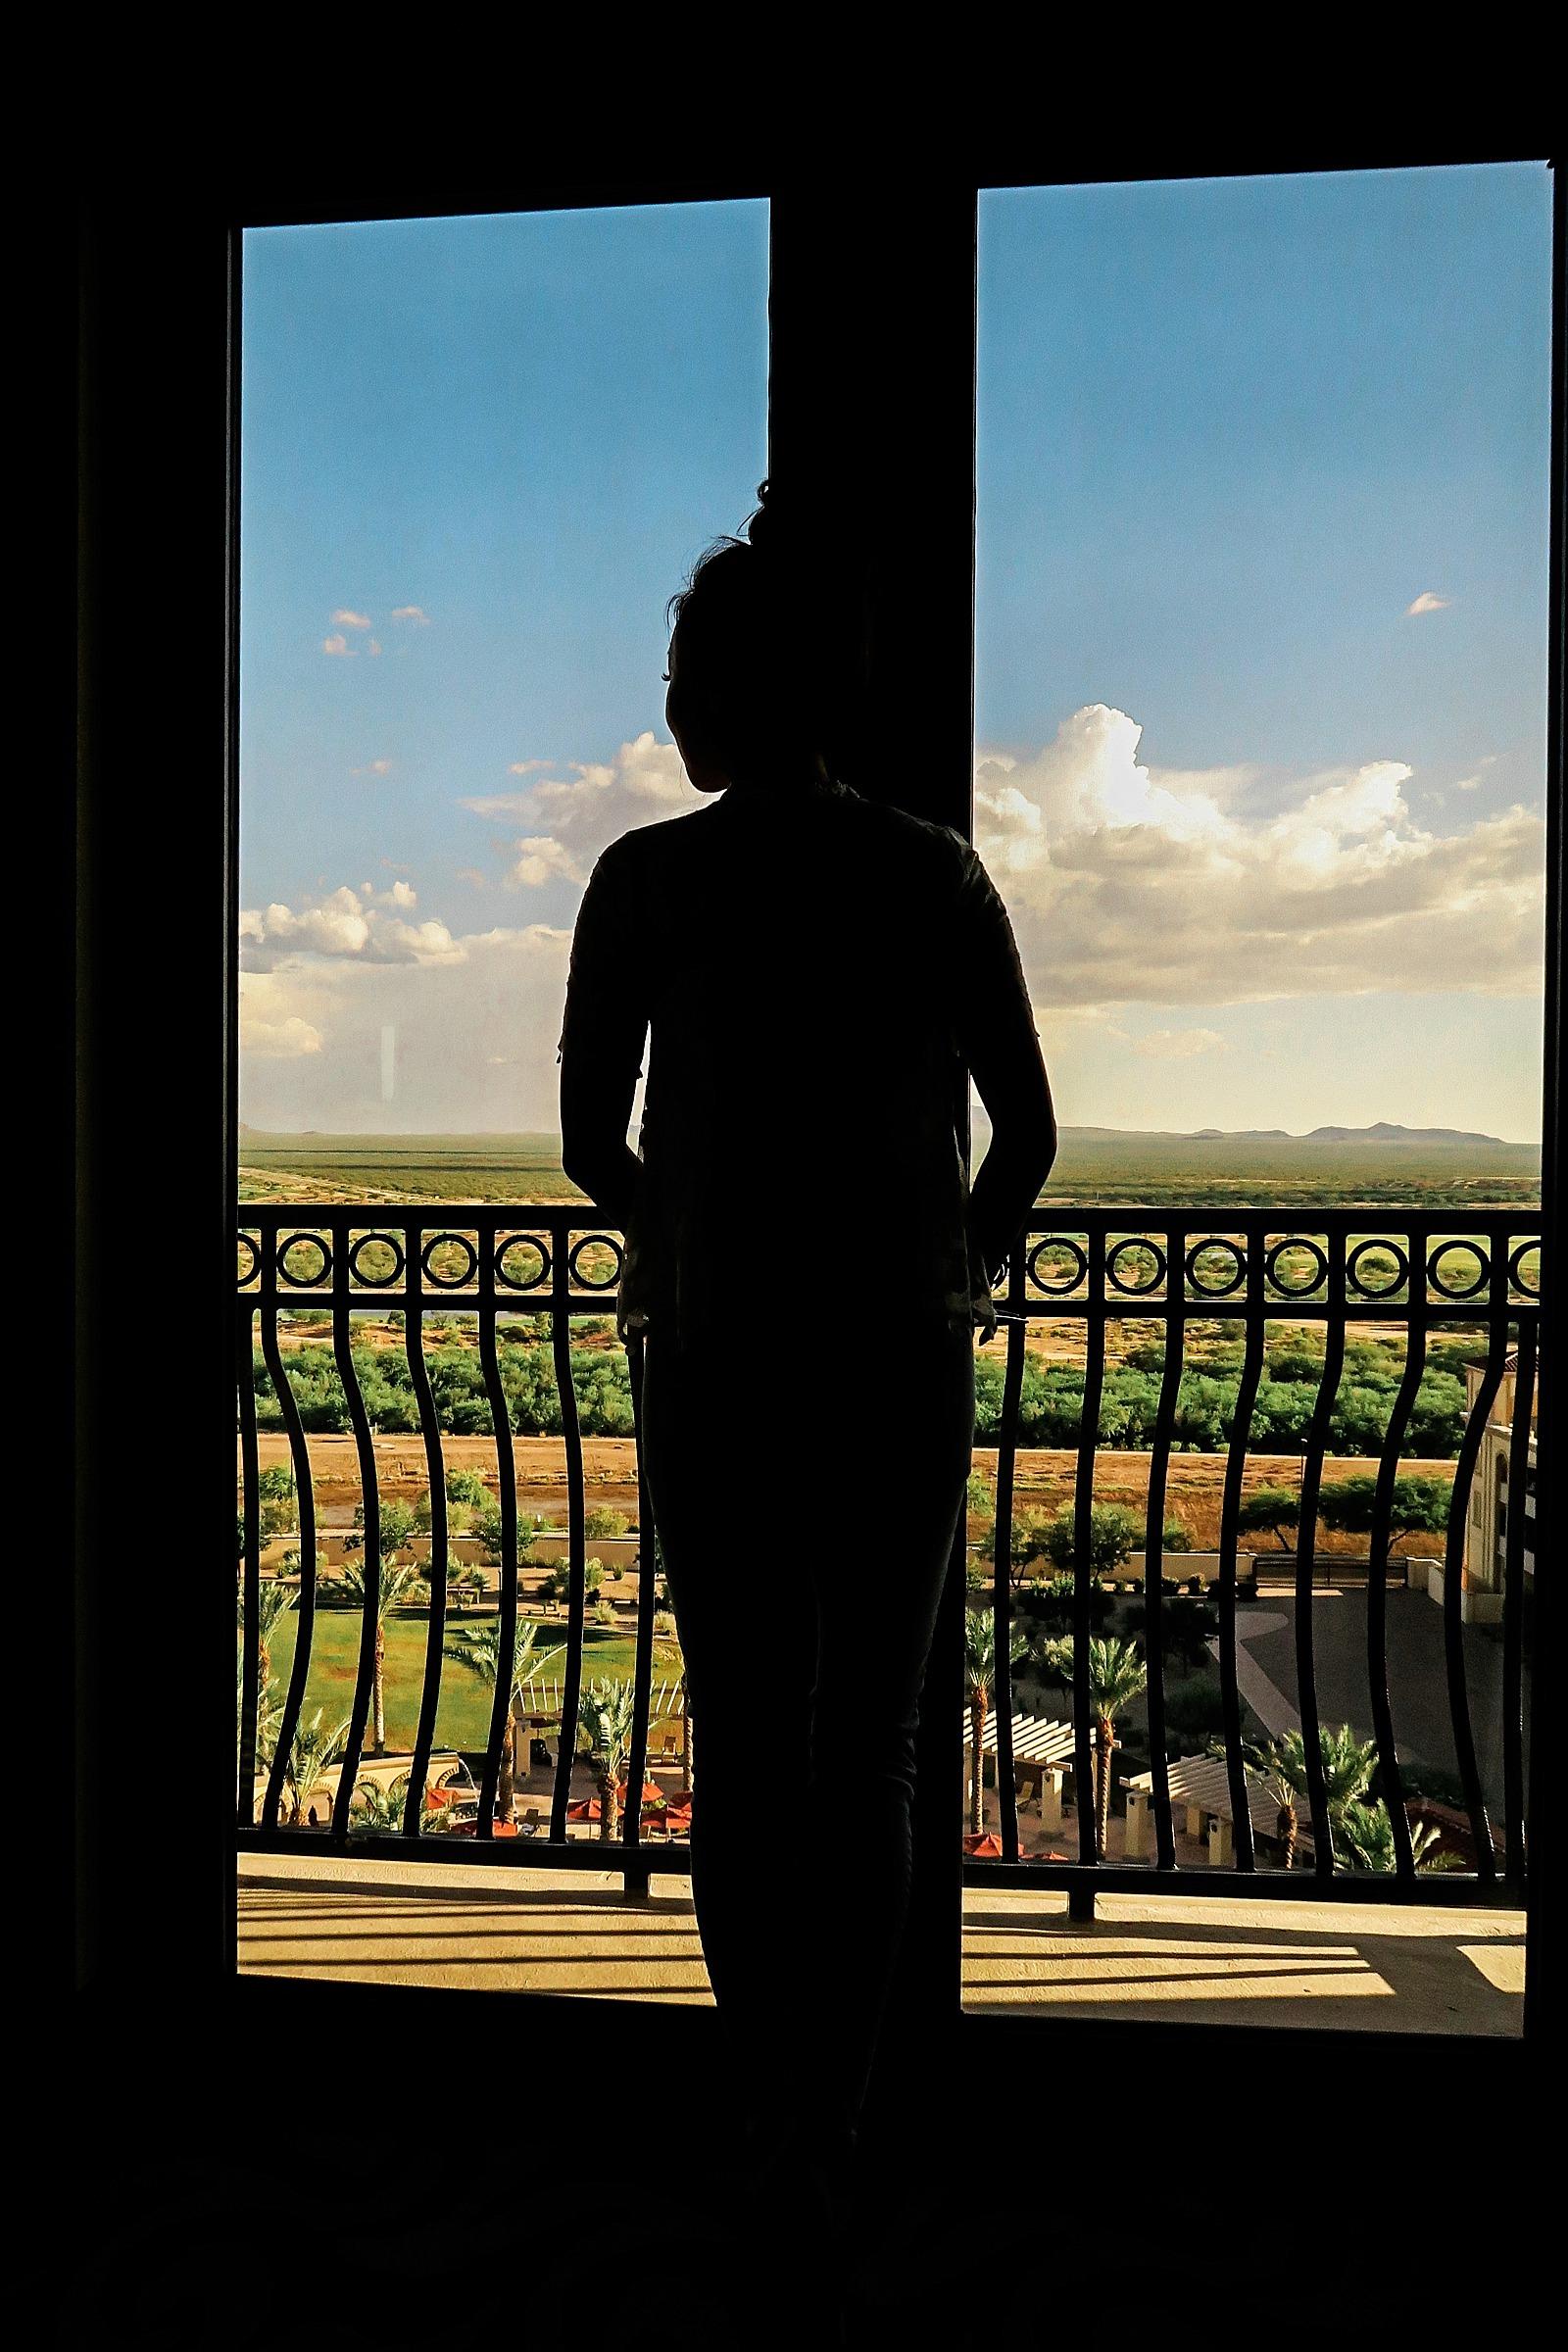 casino-del-sol-hotel-tucson-review-stay-diana-elizabeth-blog_0024